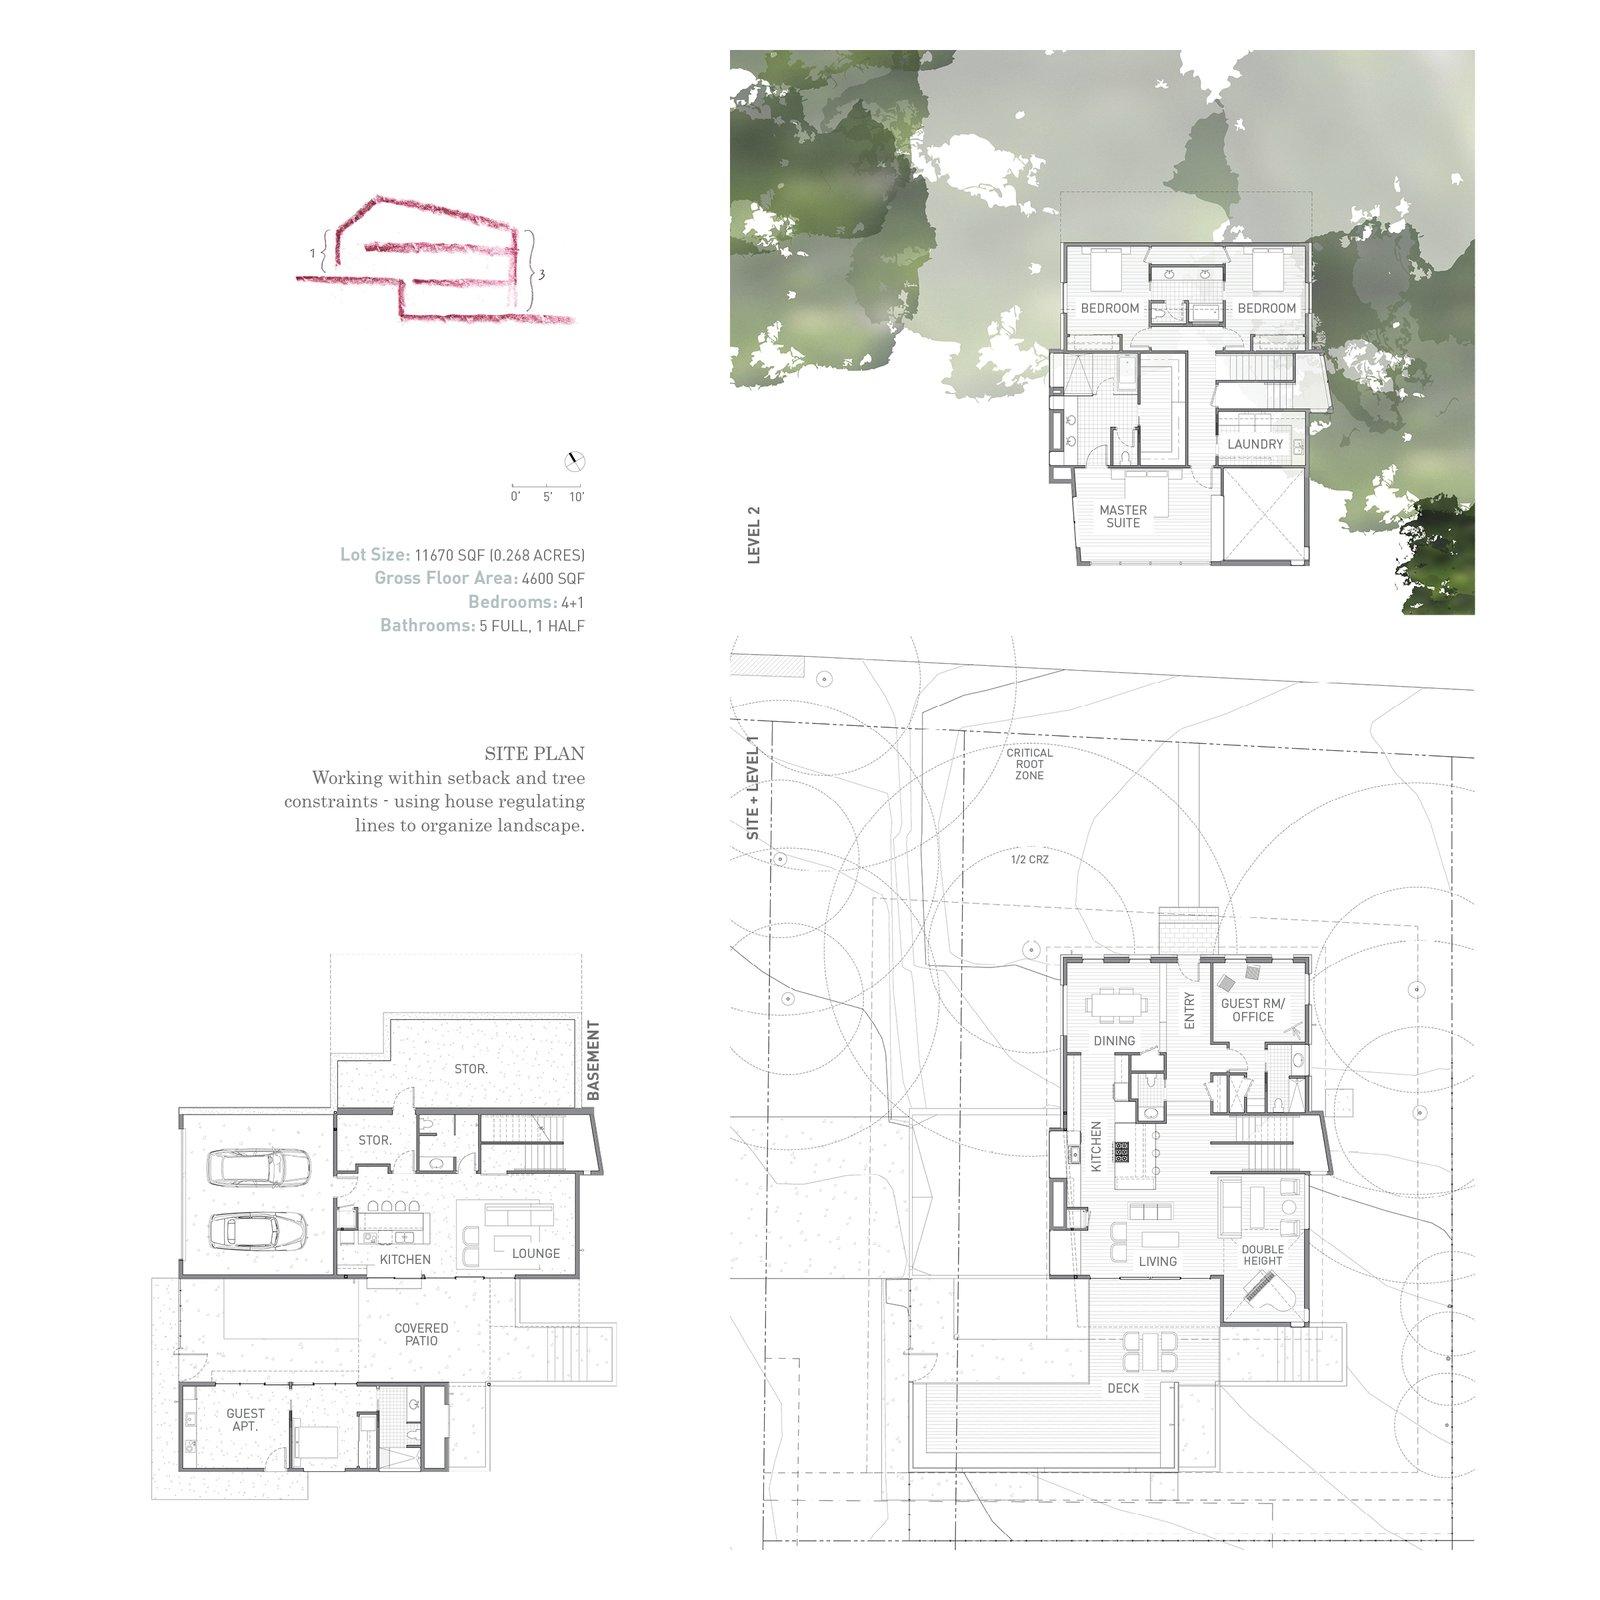 Mullet House site plans